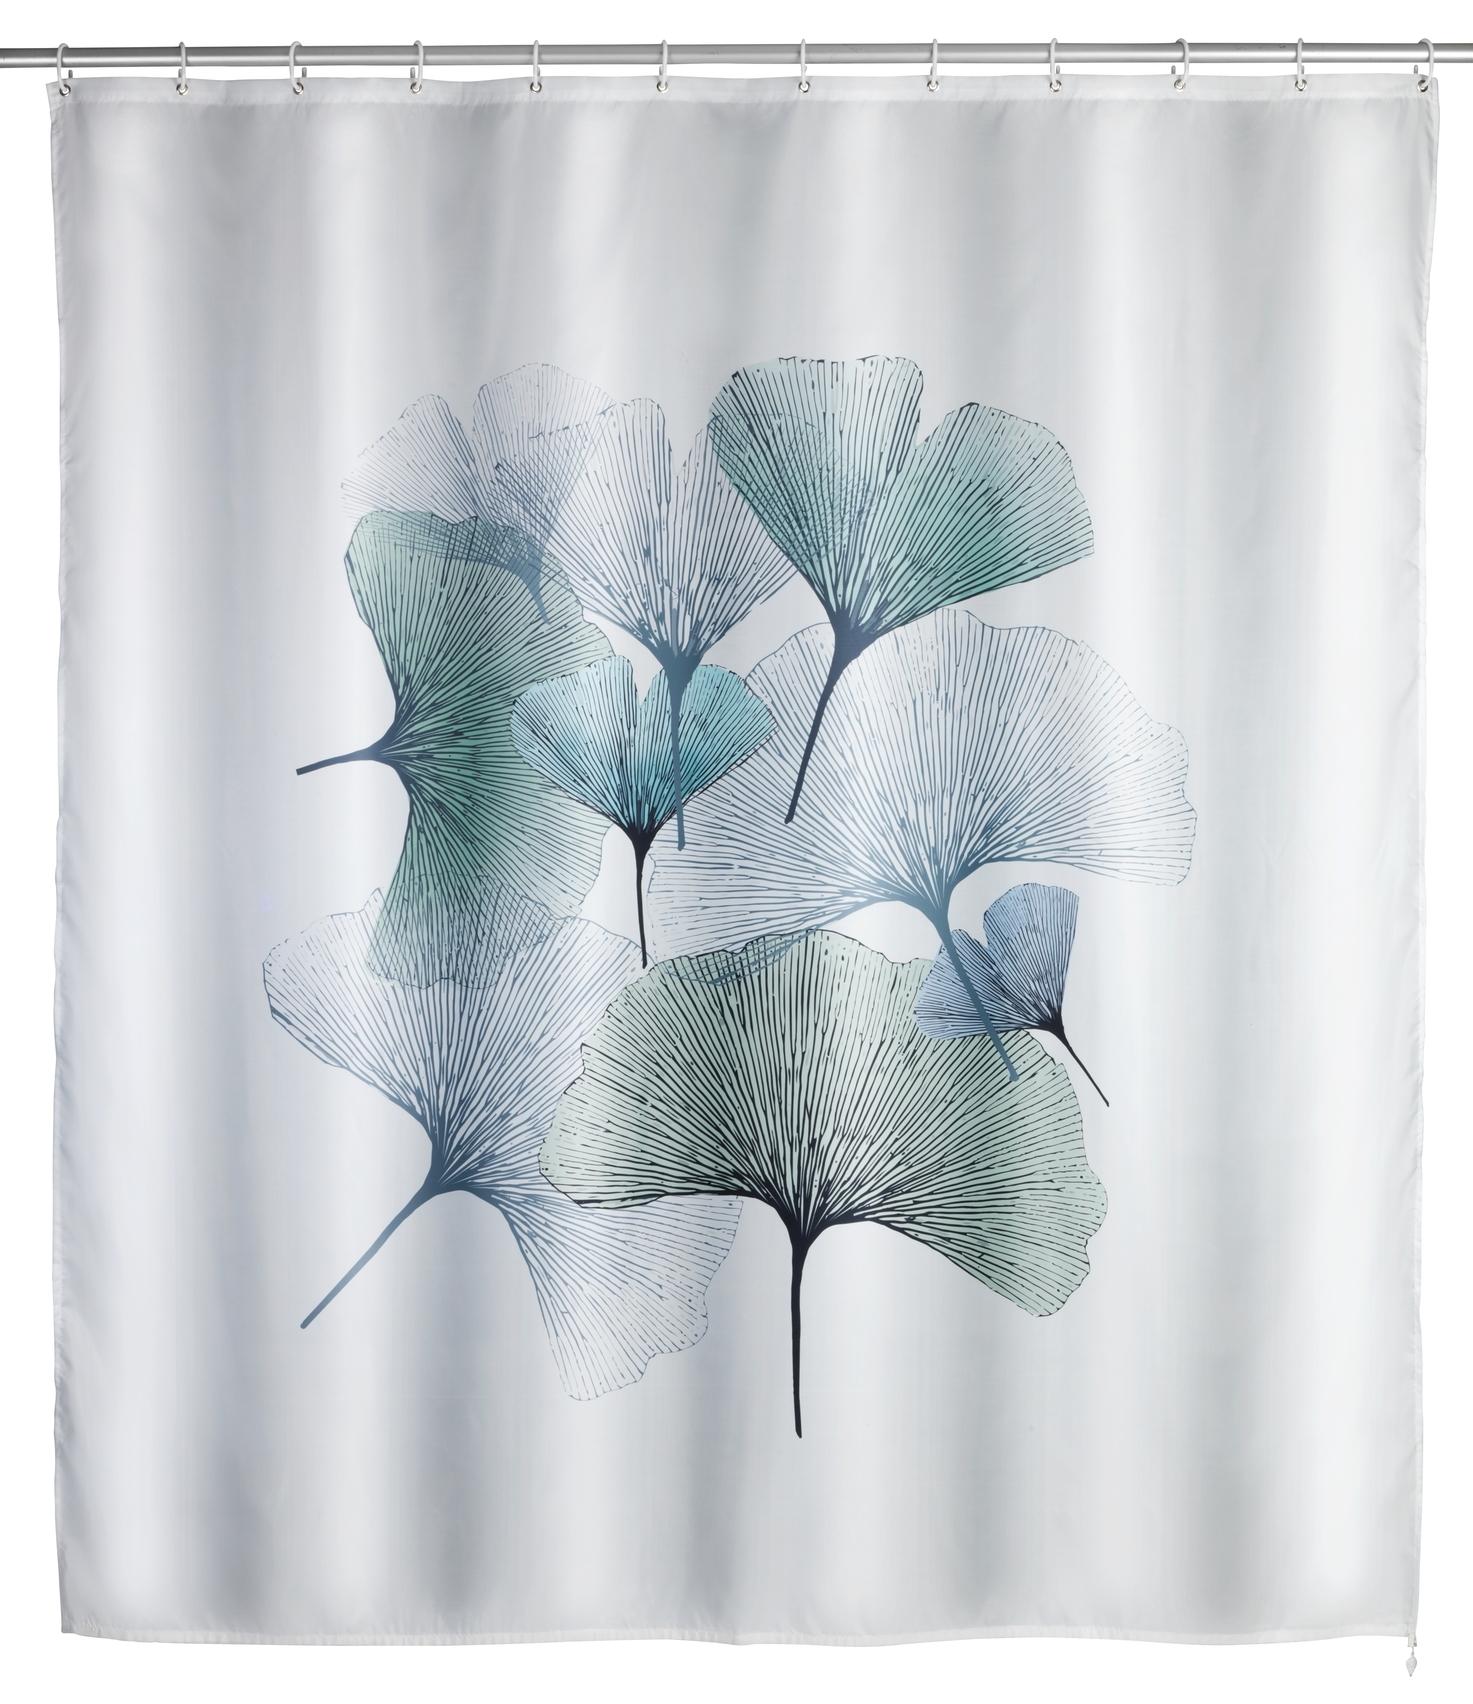 Perdea dus anti-mucegai din poliester, Ginkgo Alb, 180 x 200 cm poza